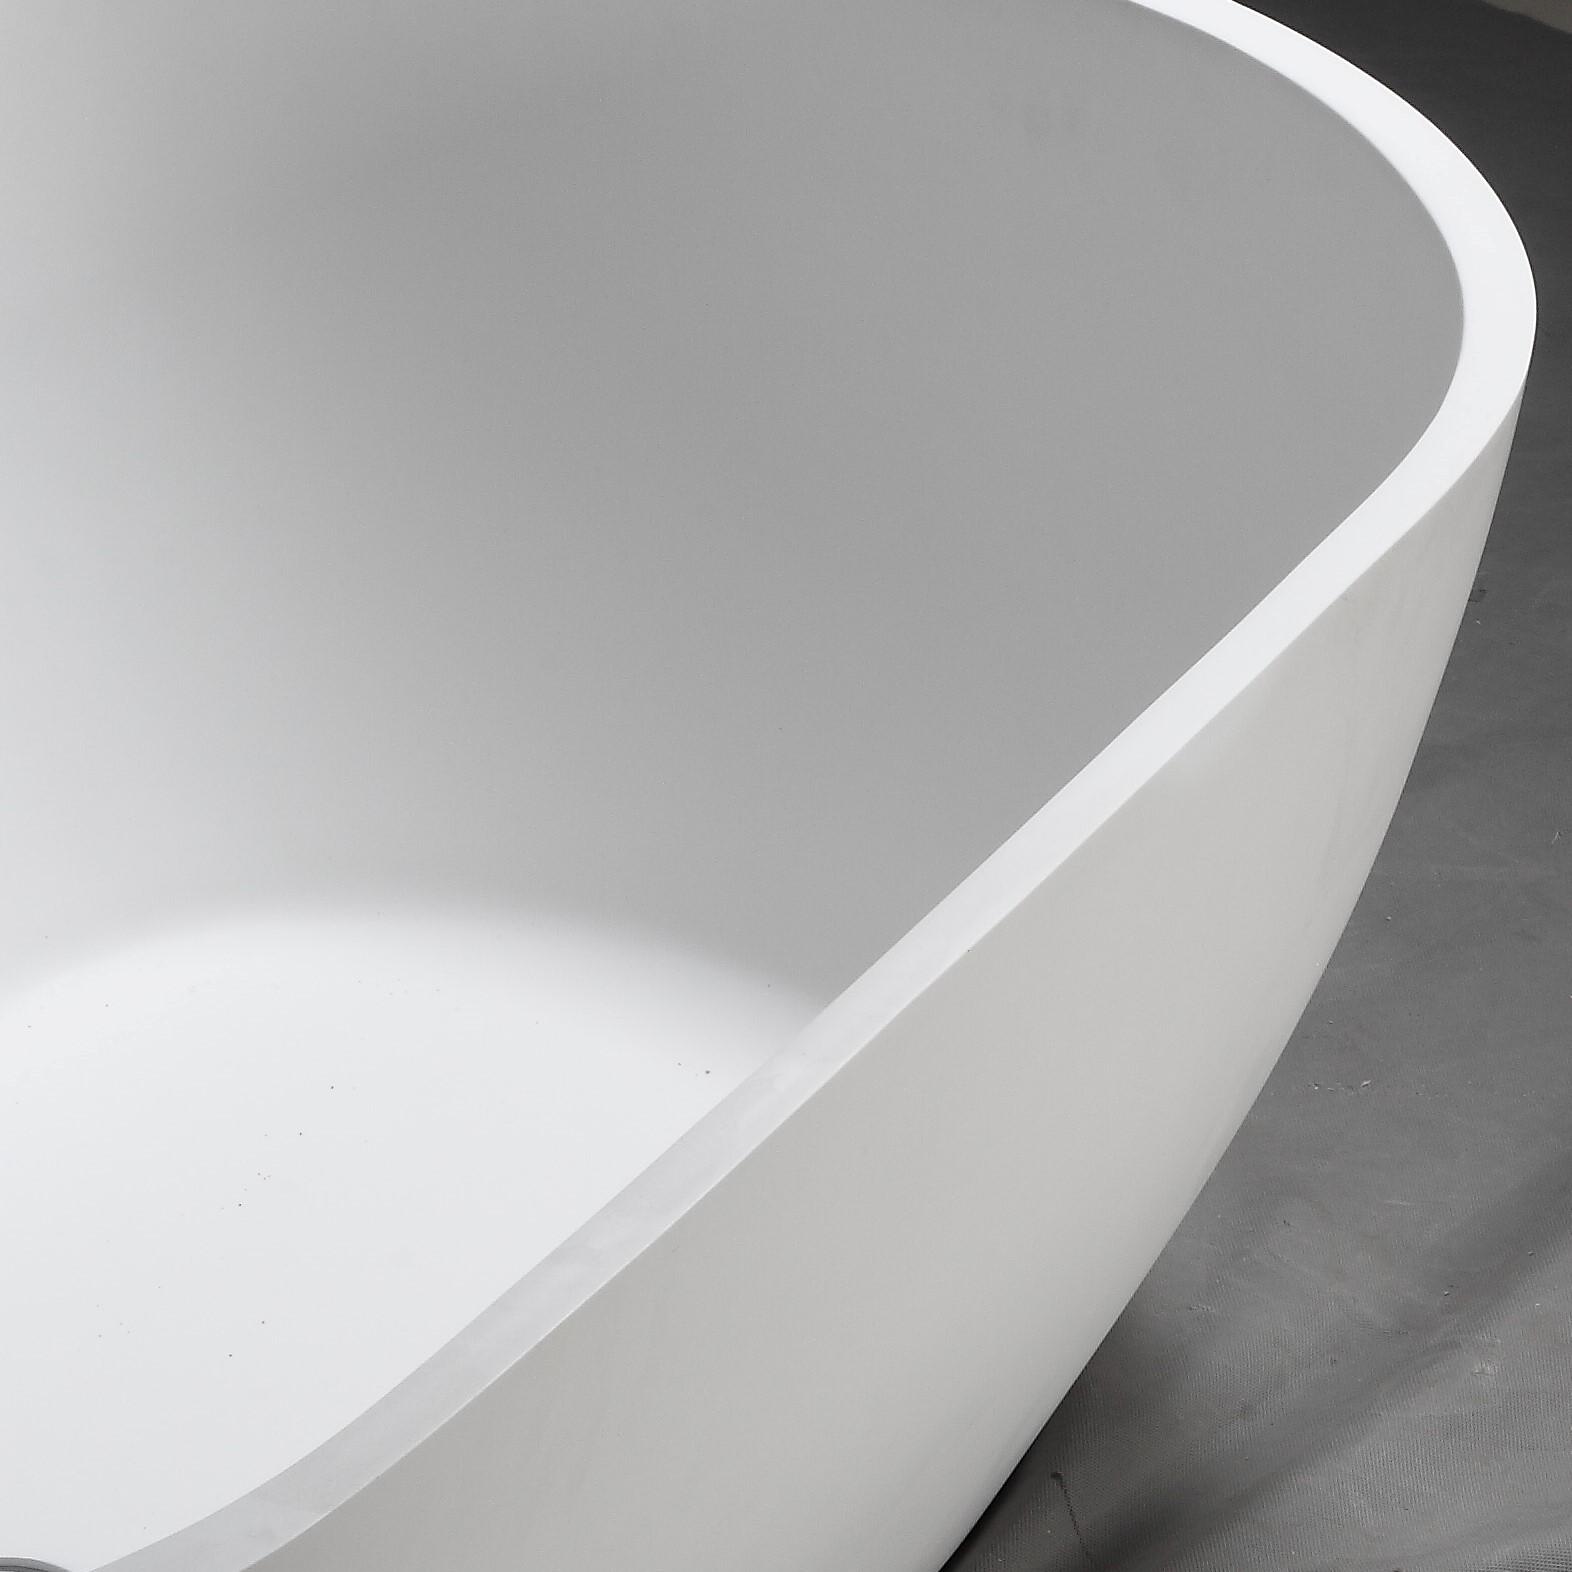 Bellissimo-Composite Stone Unique Arc Freestanding Solid Surface Bathroom-7